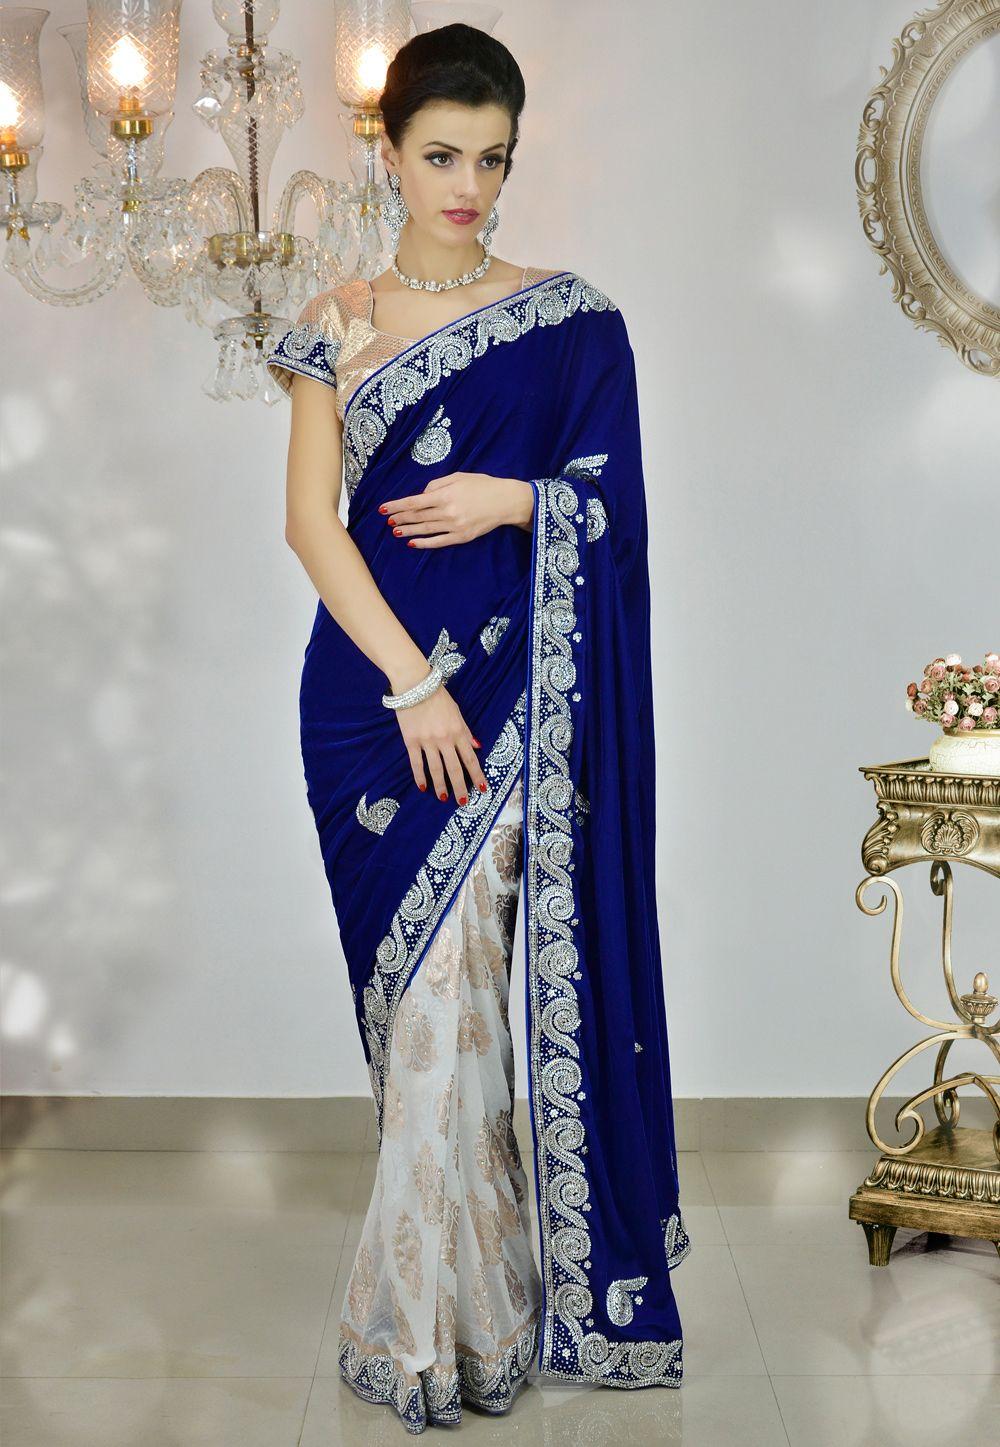 570da8ec1b6e3e Blue Velvet #Saree with Blouse | Party Wear Sarees Online | Saree ...